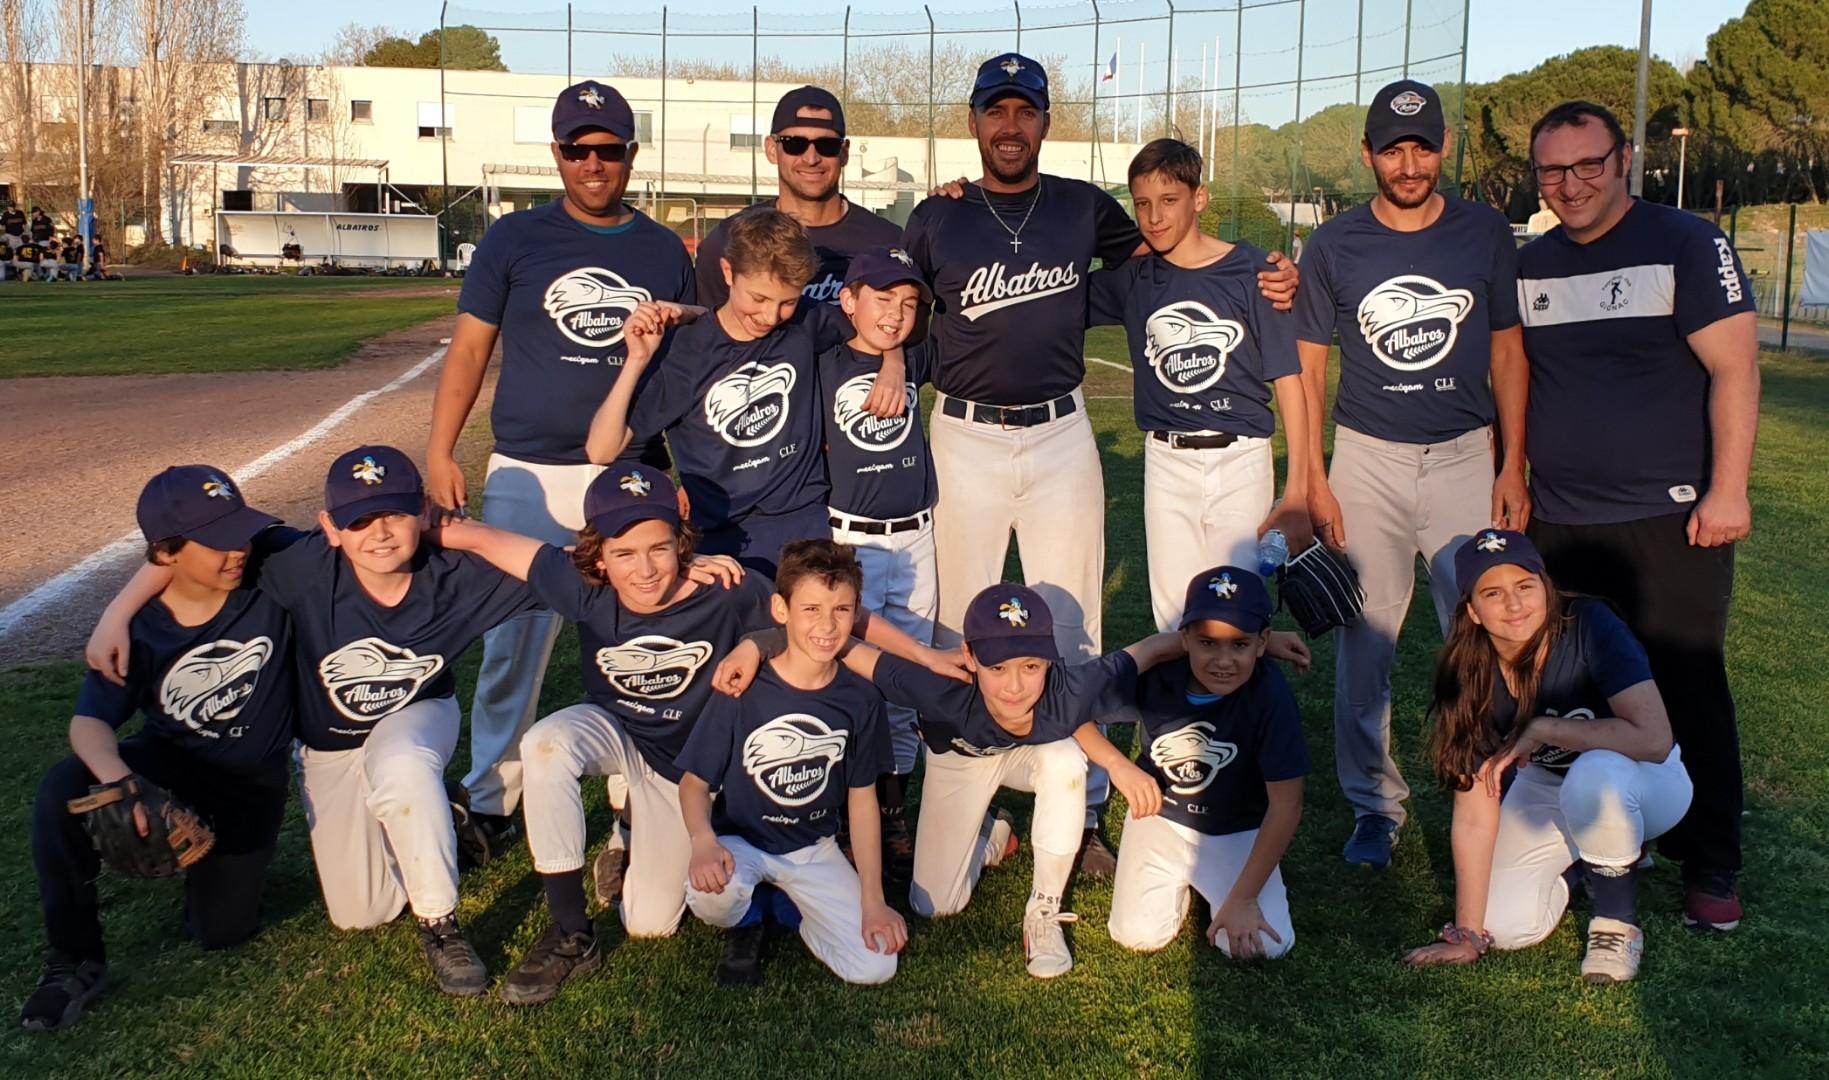 albatros-baseball-12U-23-03-19g